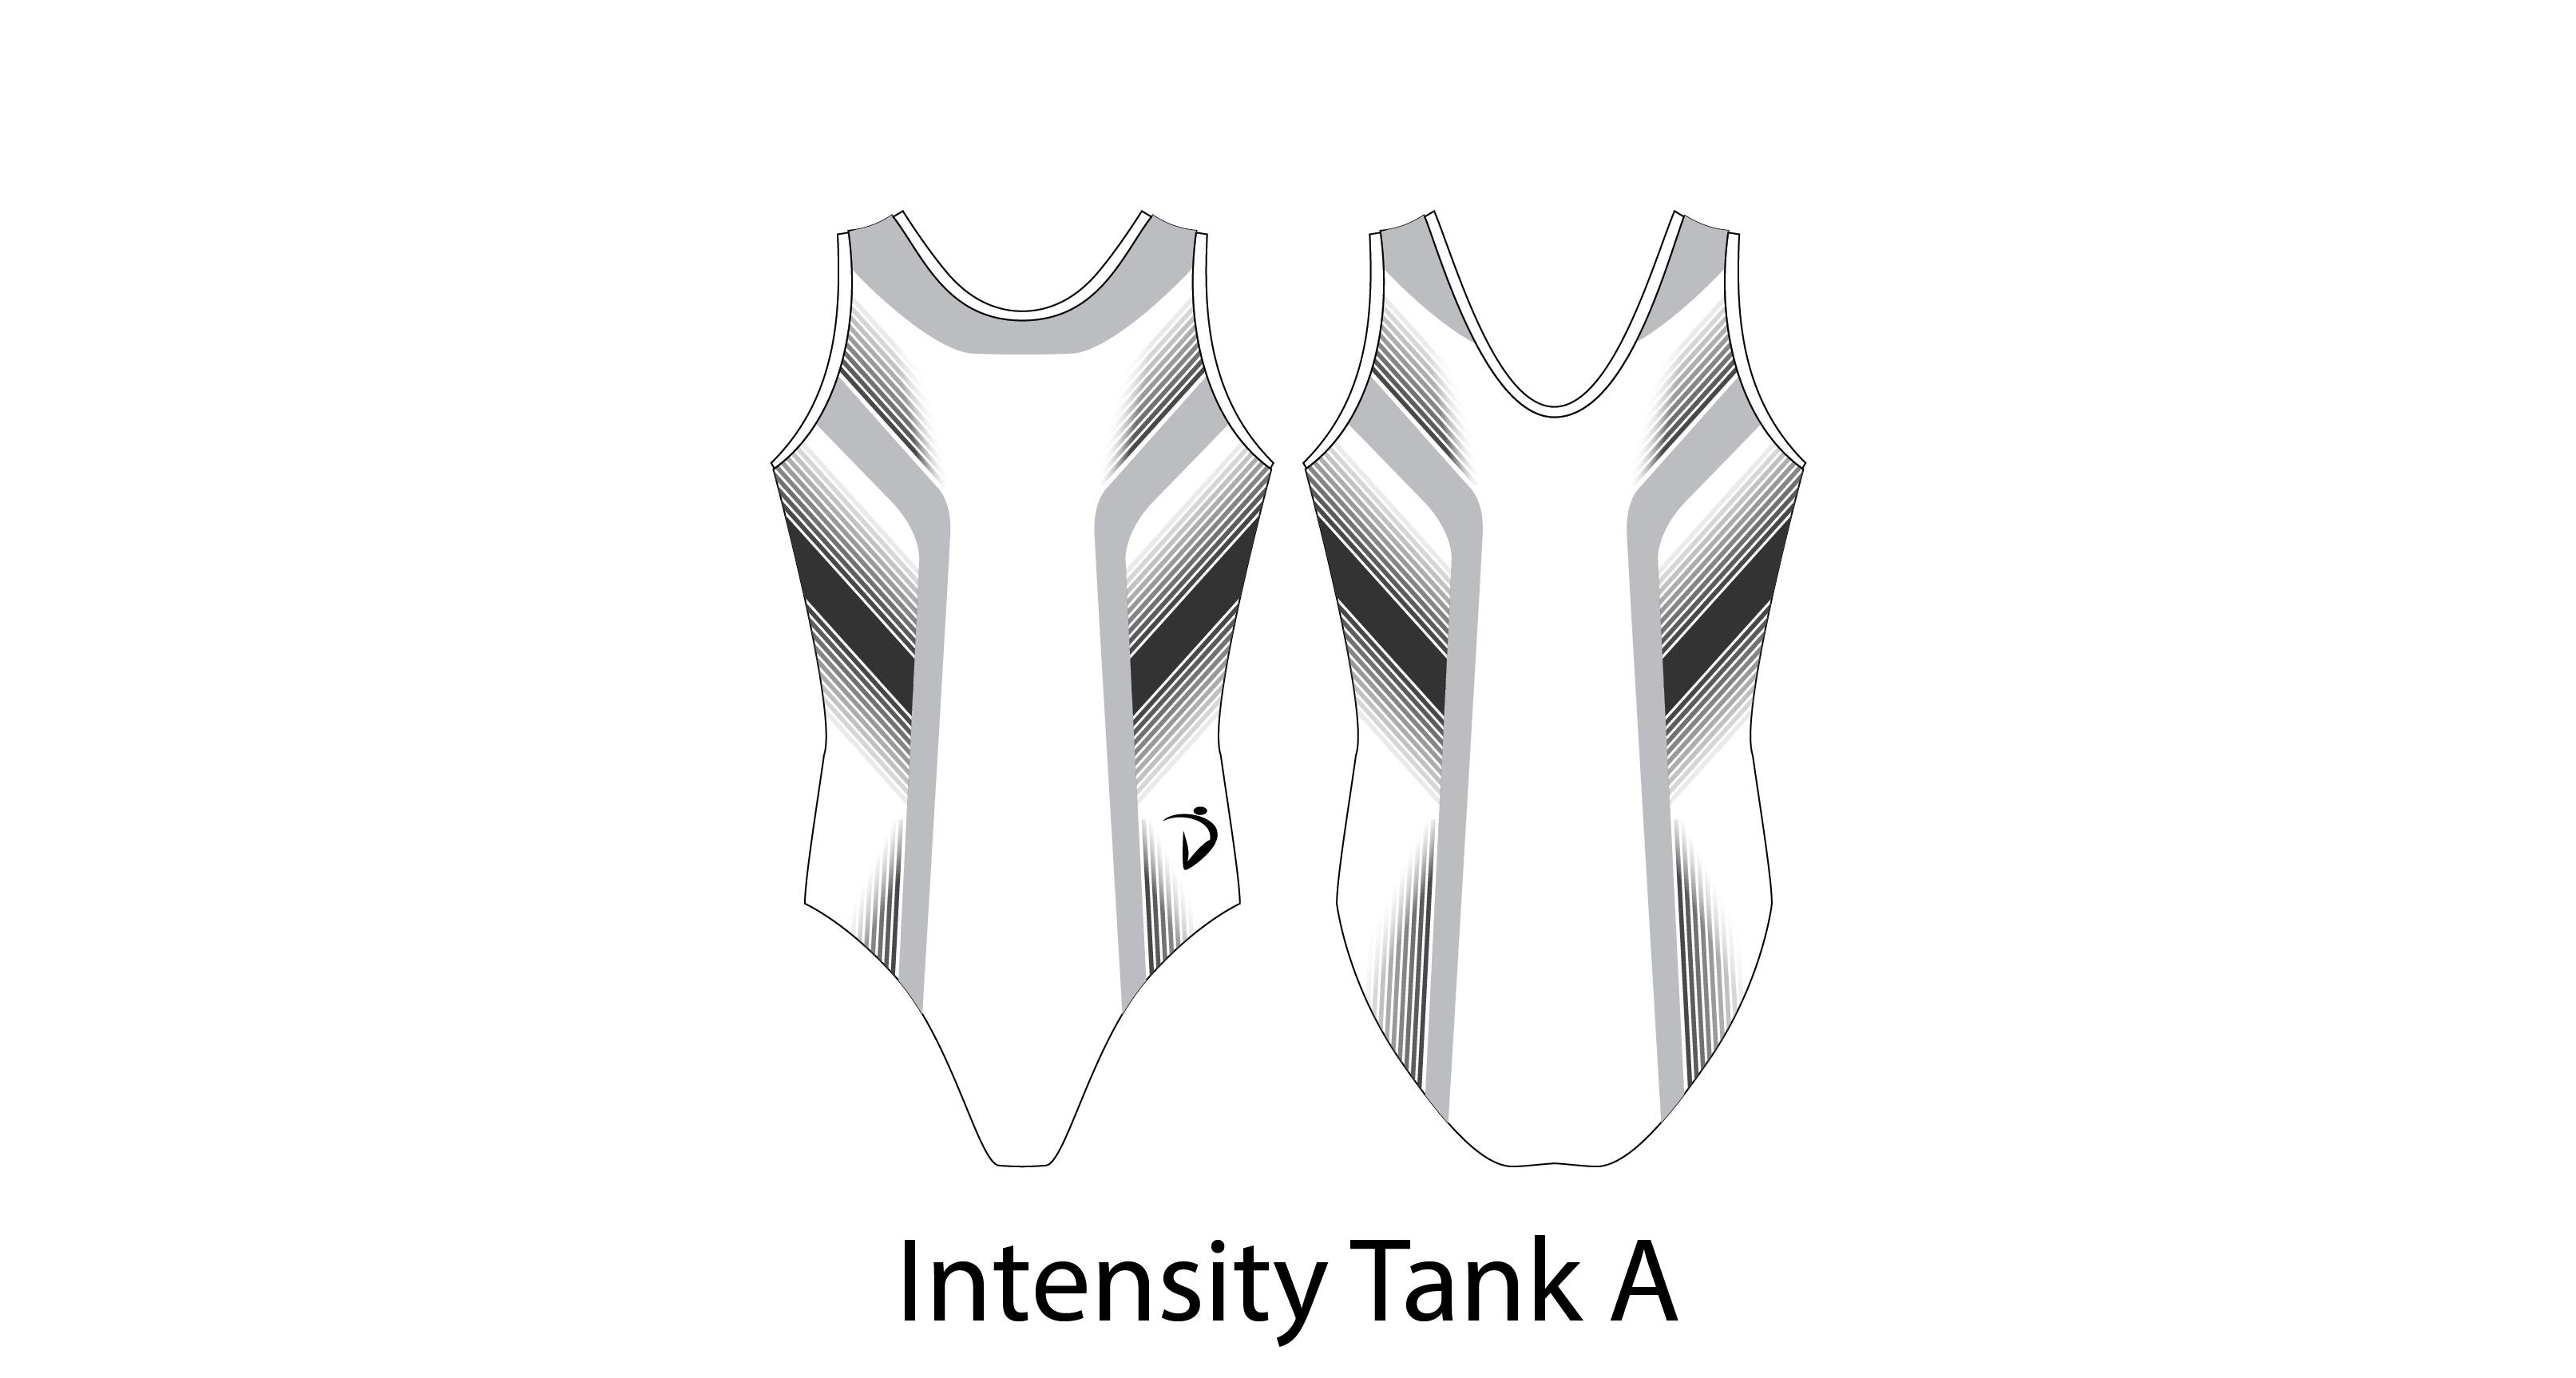 Intensity Tank A